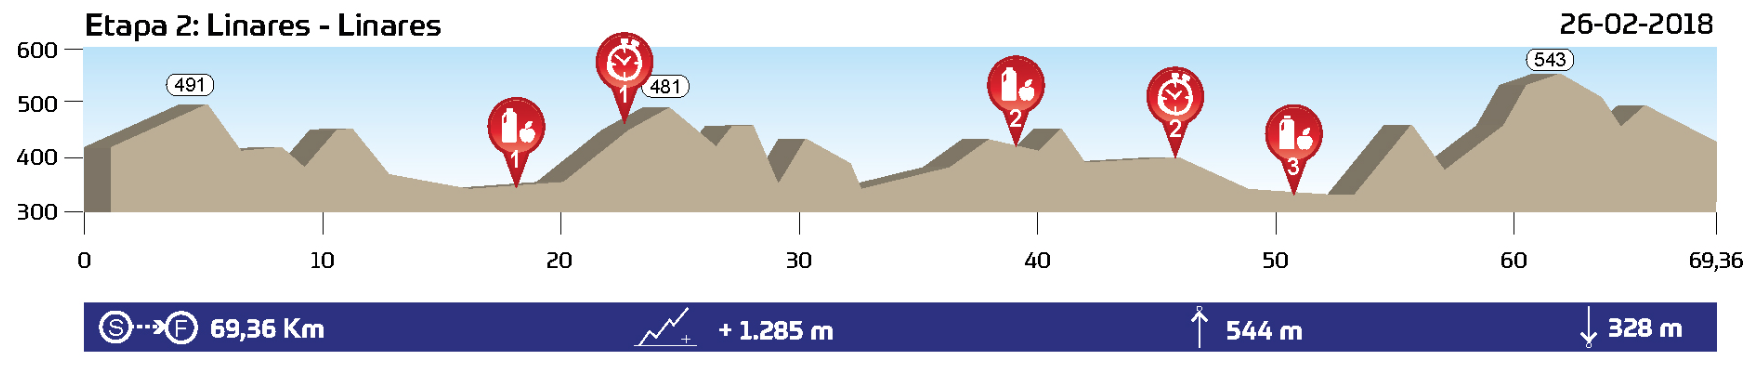 etapa 2 Andalucía bike race perfil